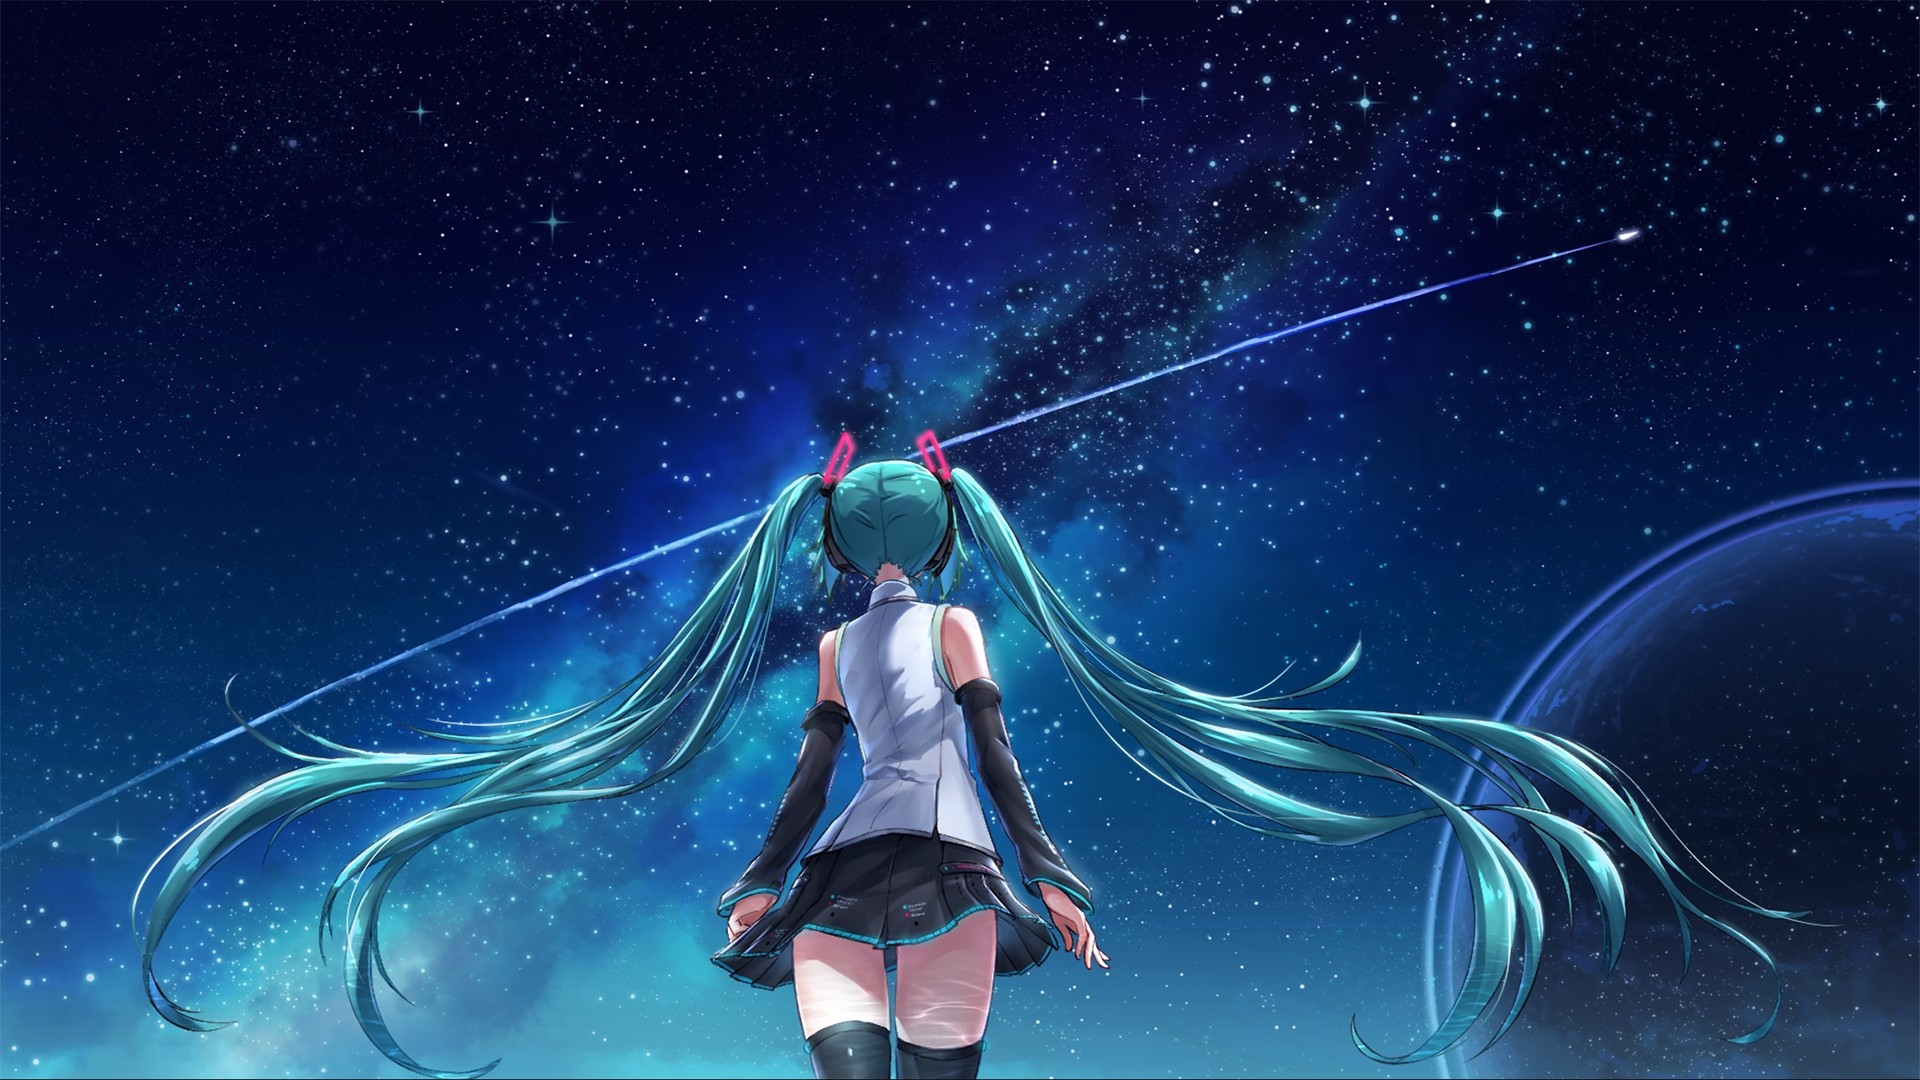 Hatsune Miku Background